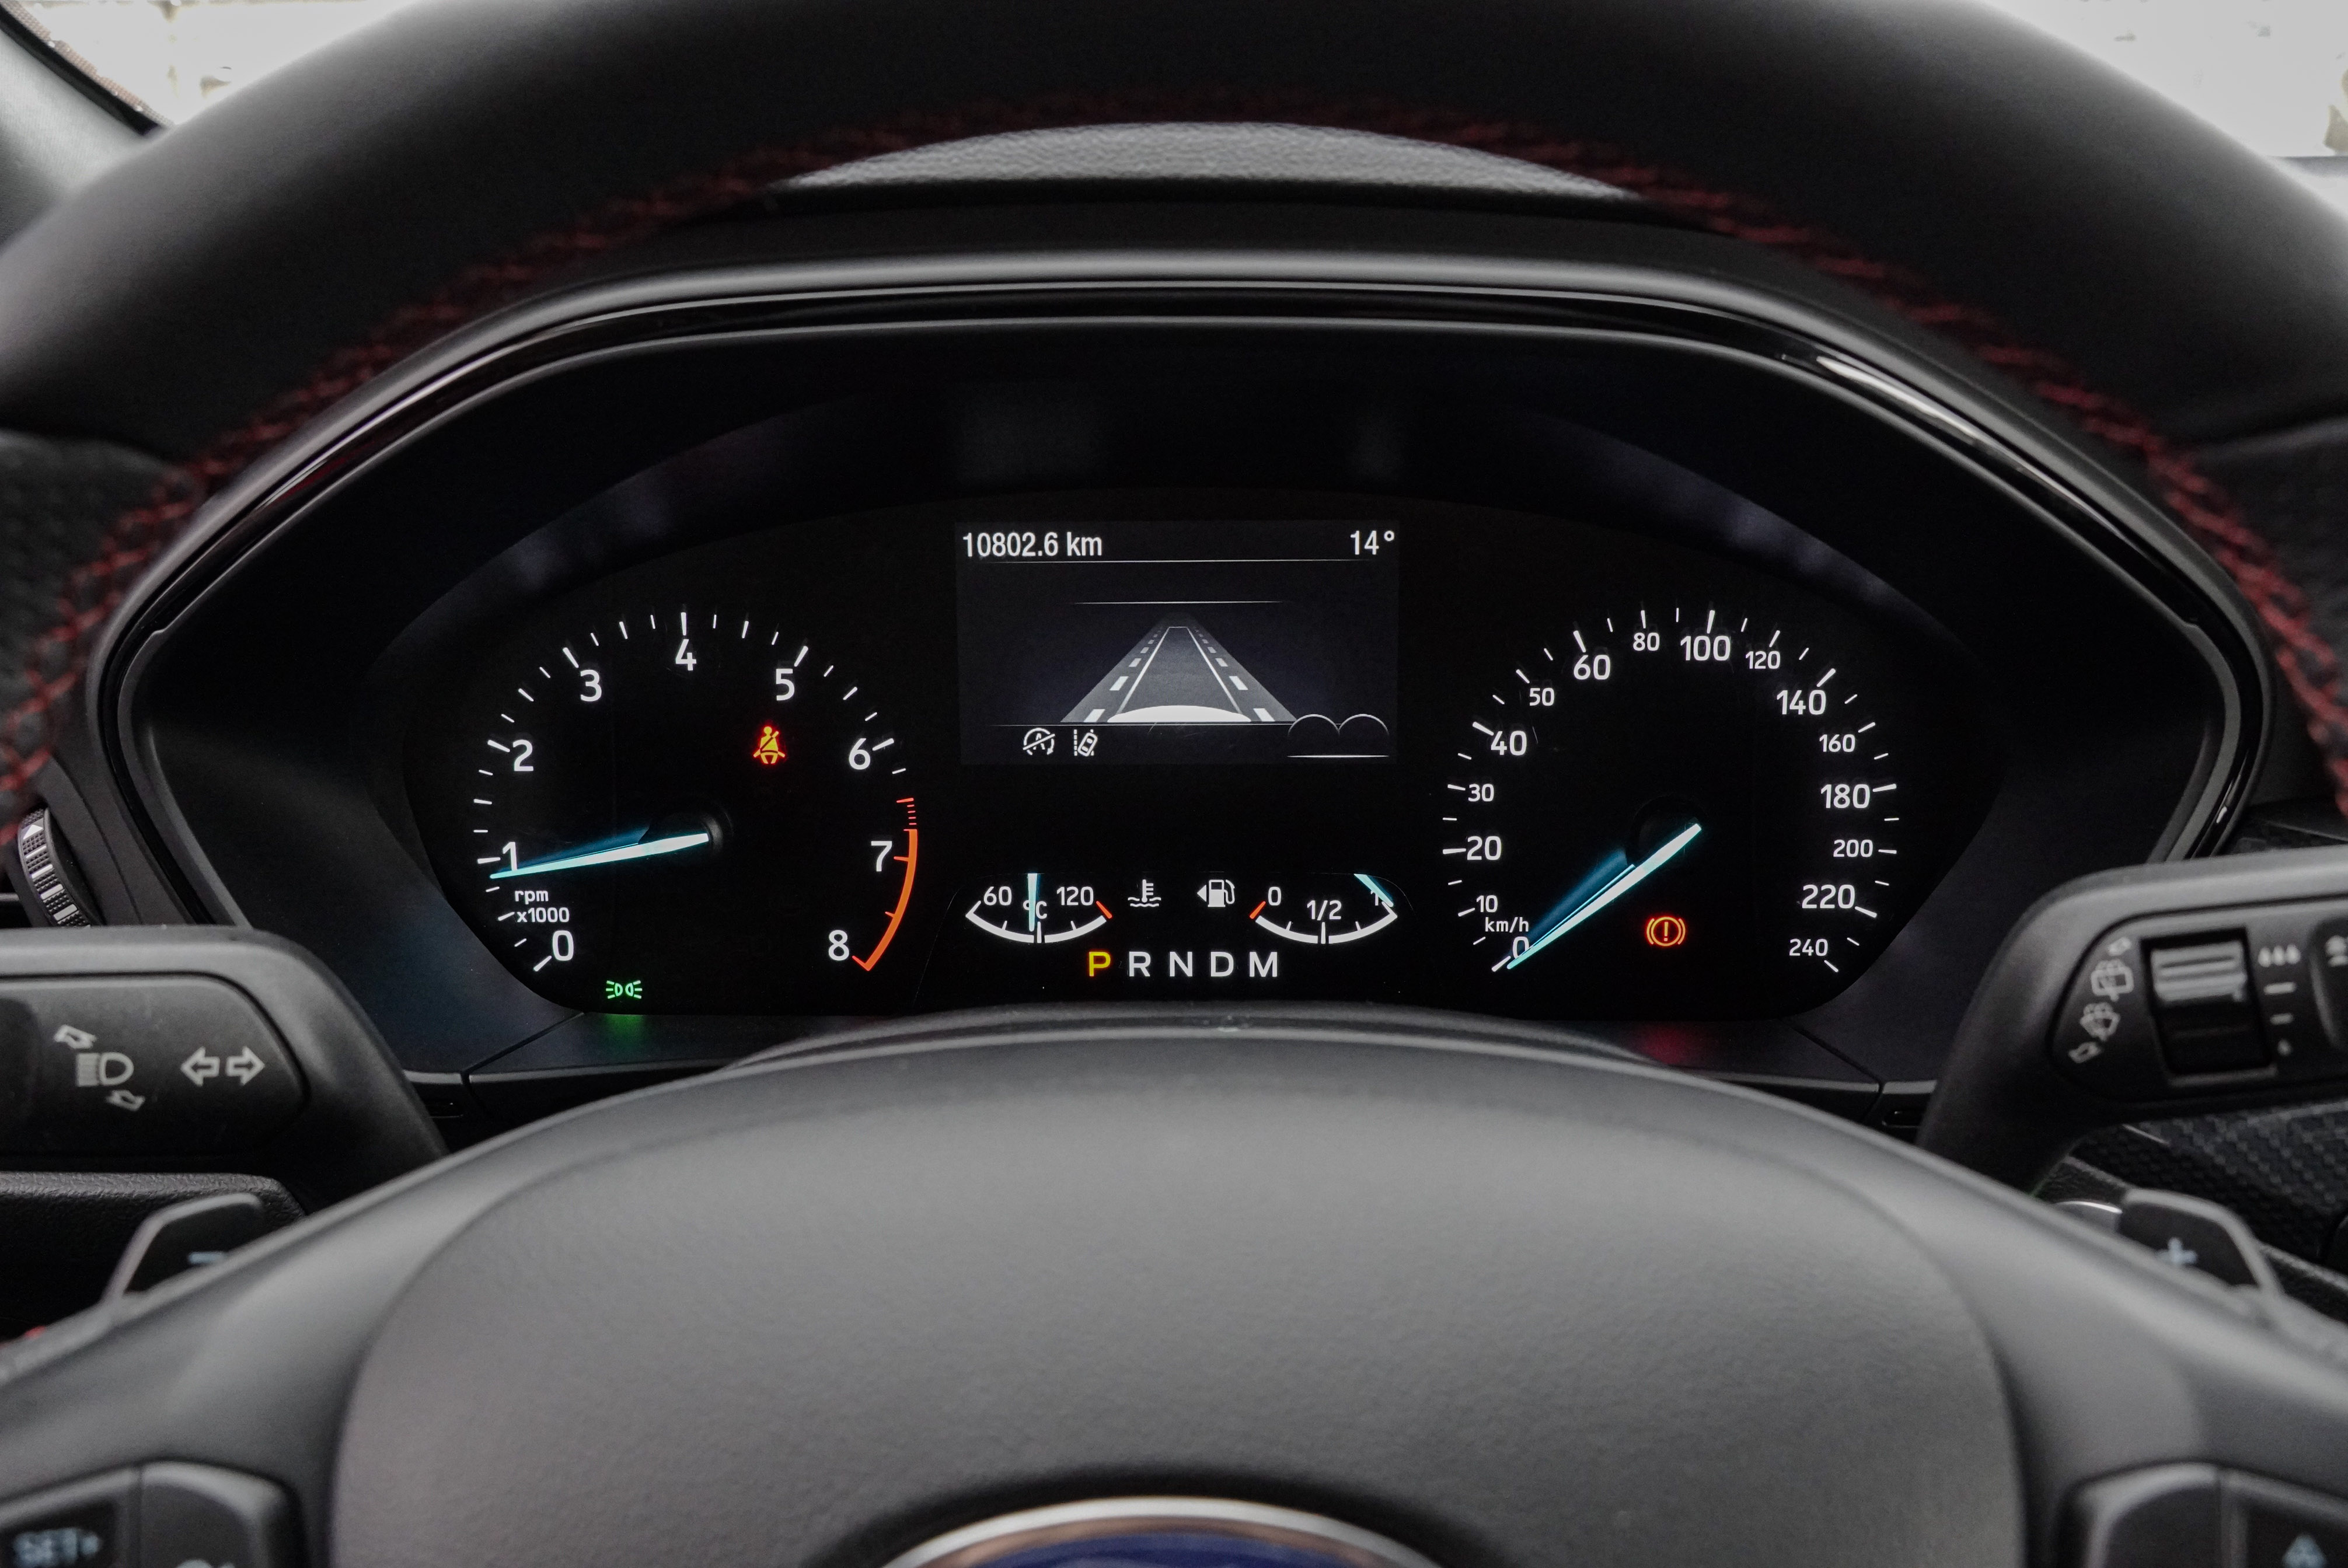 ST-Line、Lommel 標配 Ford Co-Pilot360™ 全方位智駕科技輔助系統(Level 2 自動駕駛輔助系統)。